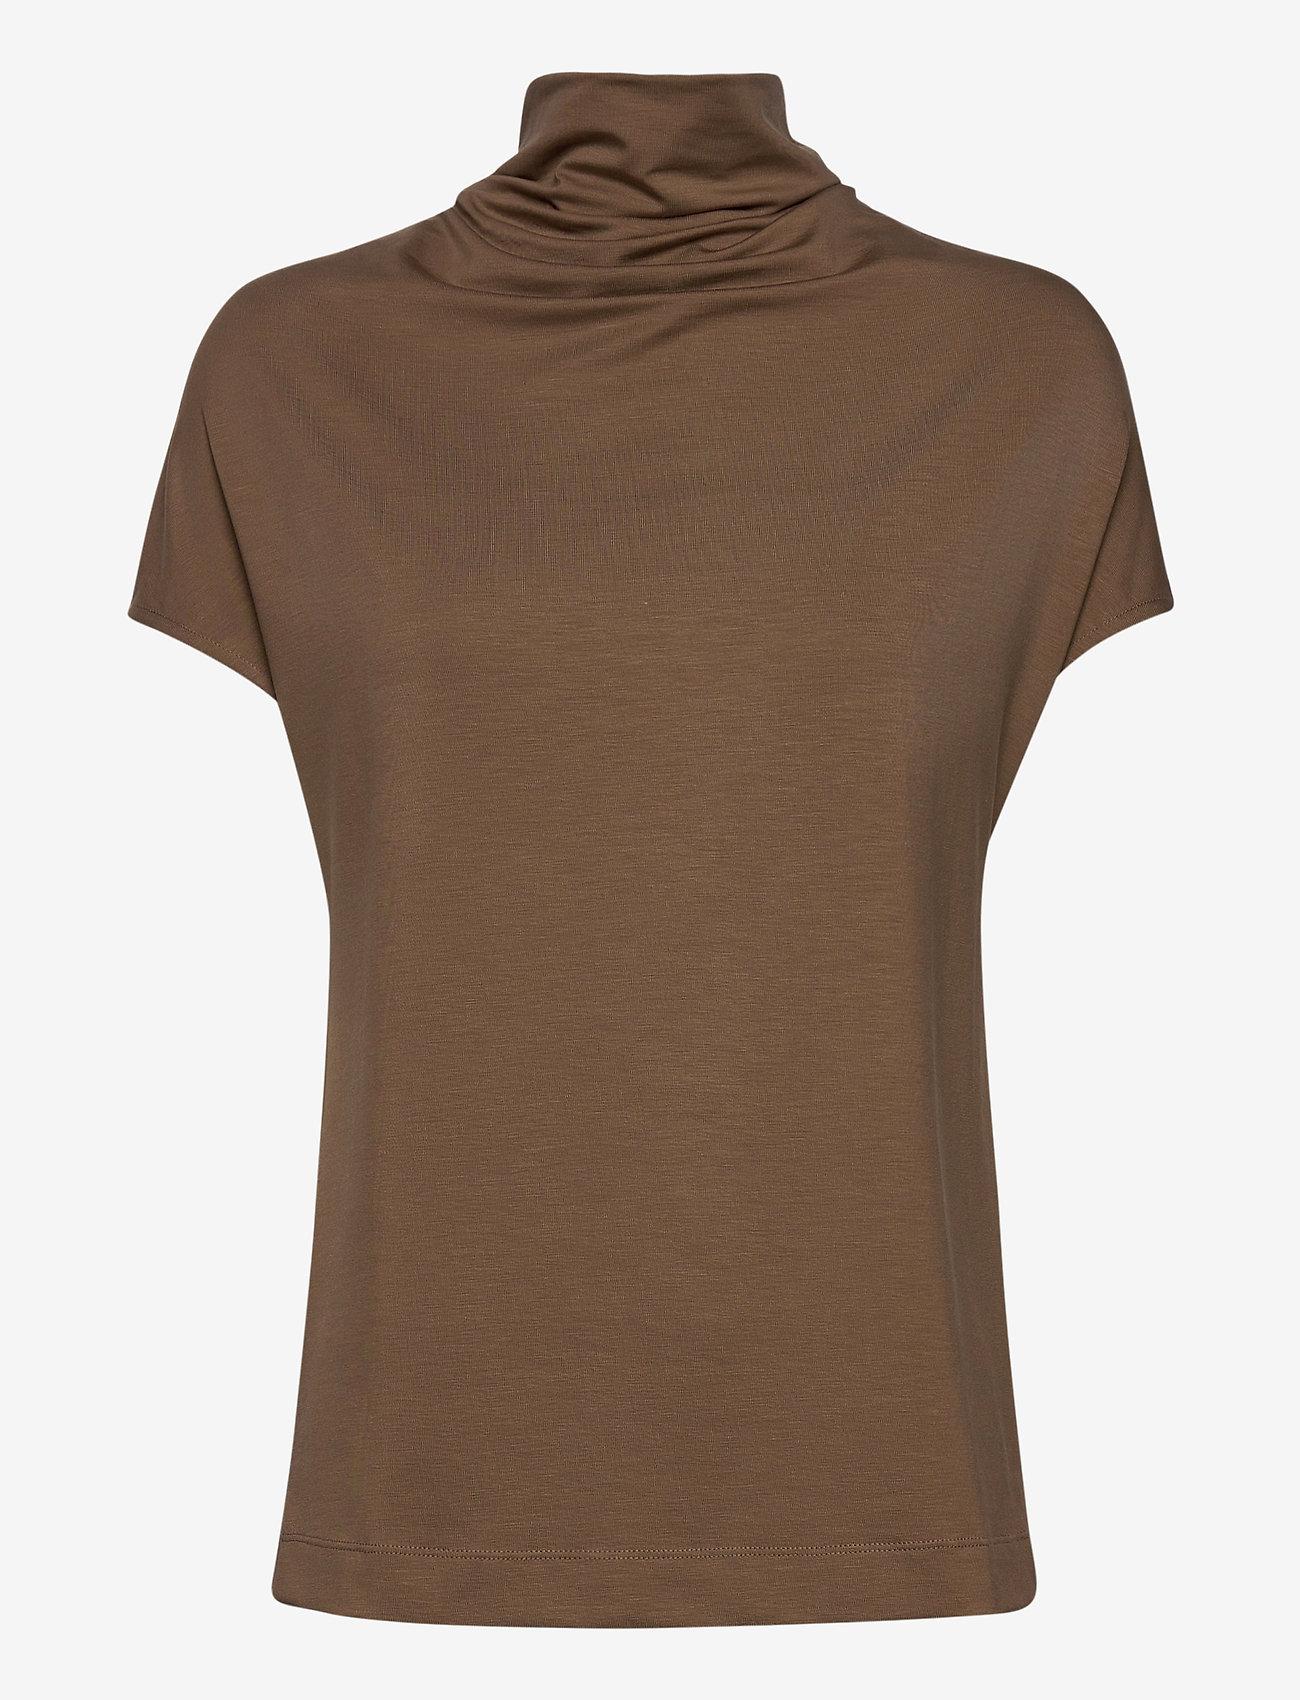 Residus - LUCA TENCEL TOP - t-shirts - mole - 0